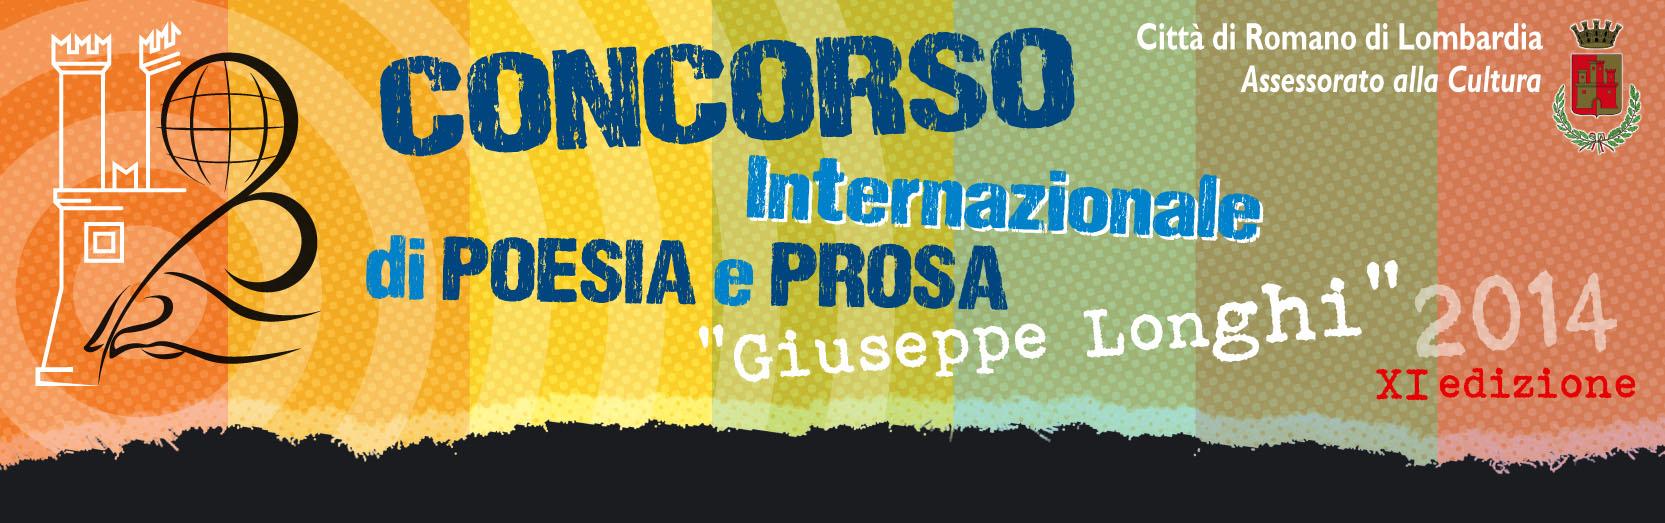 2014 -XI edizione